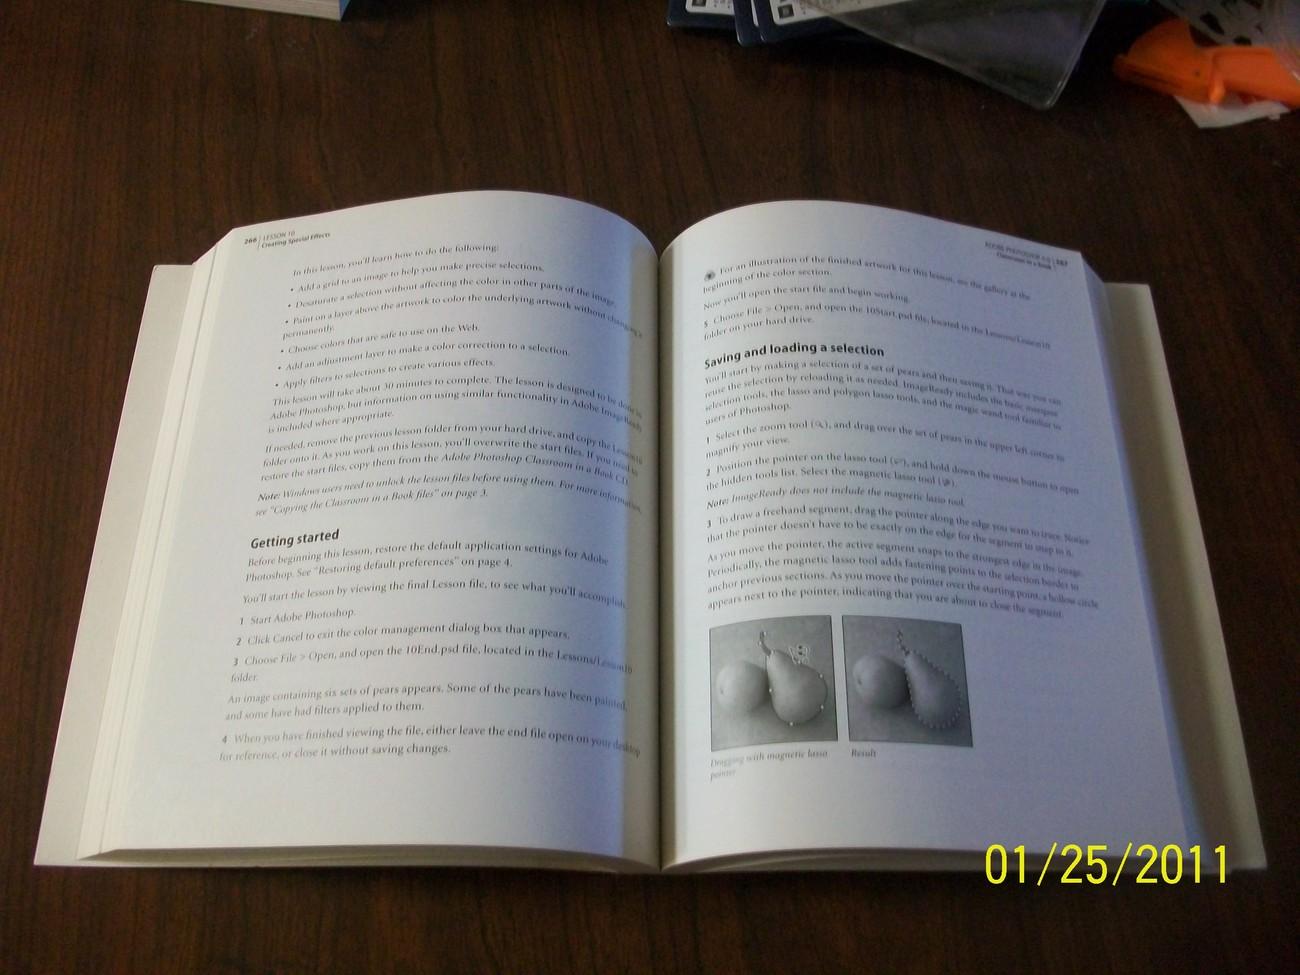 adobe photoshop 6.0 classroom in a book ISBN 0201710161